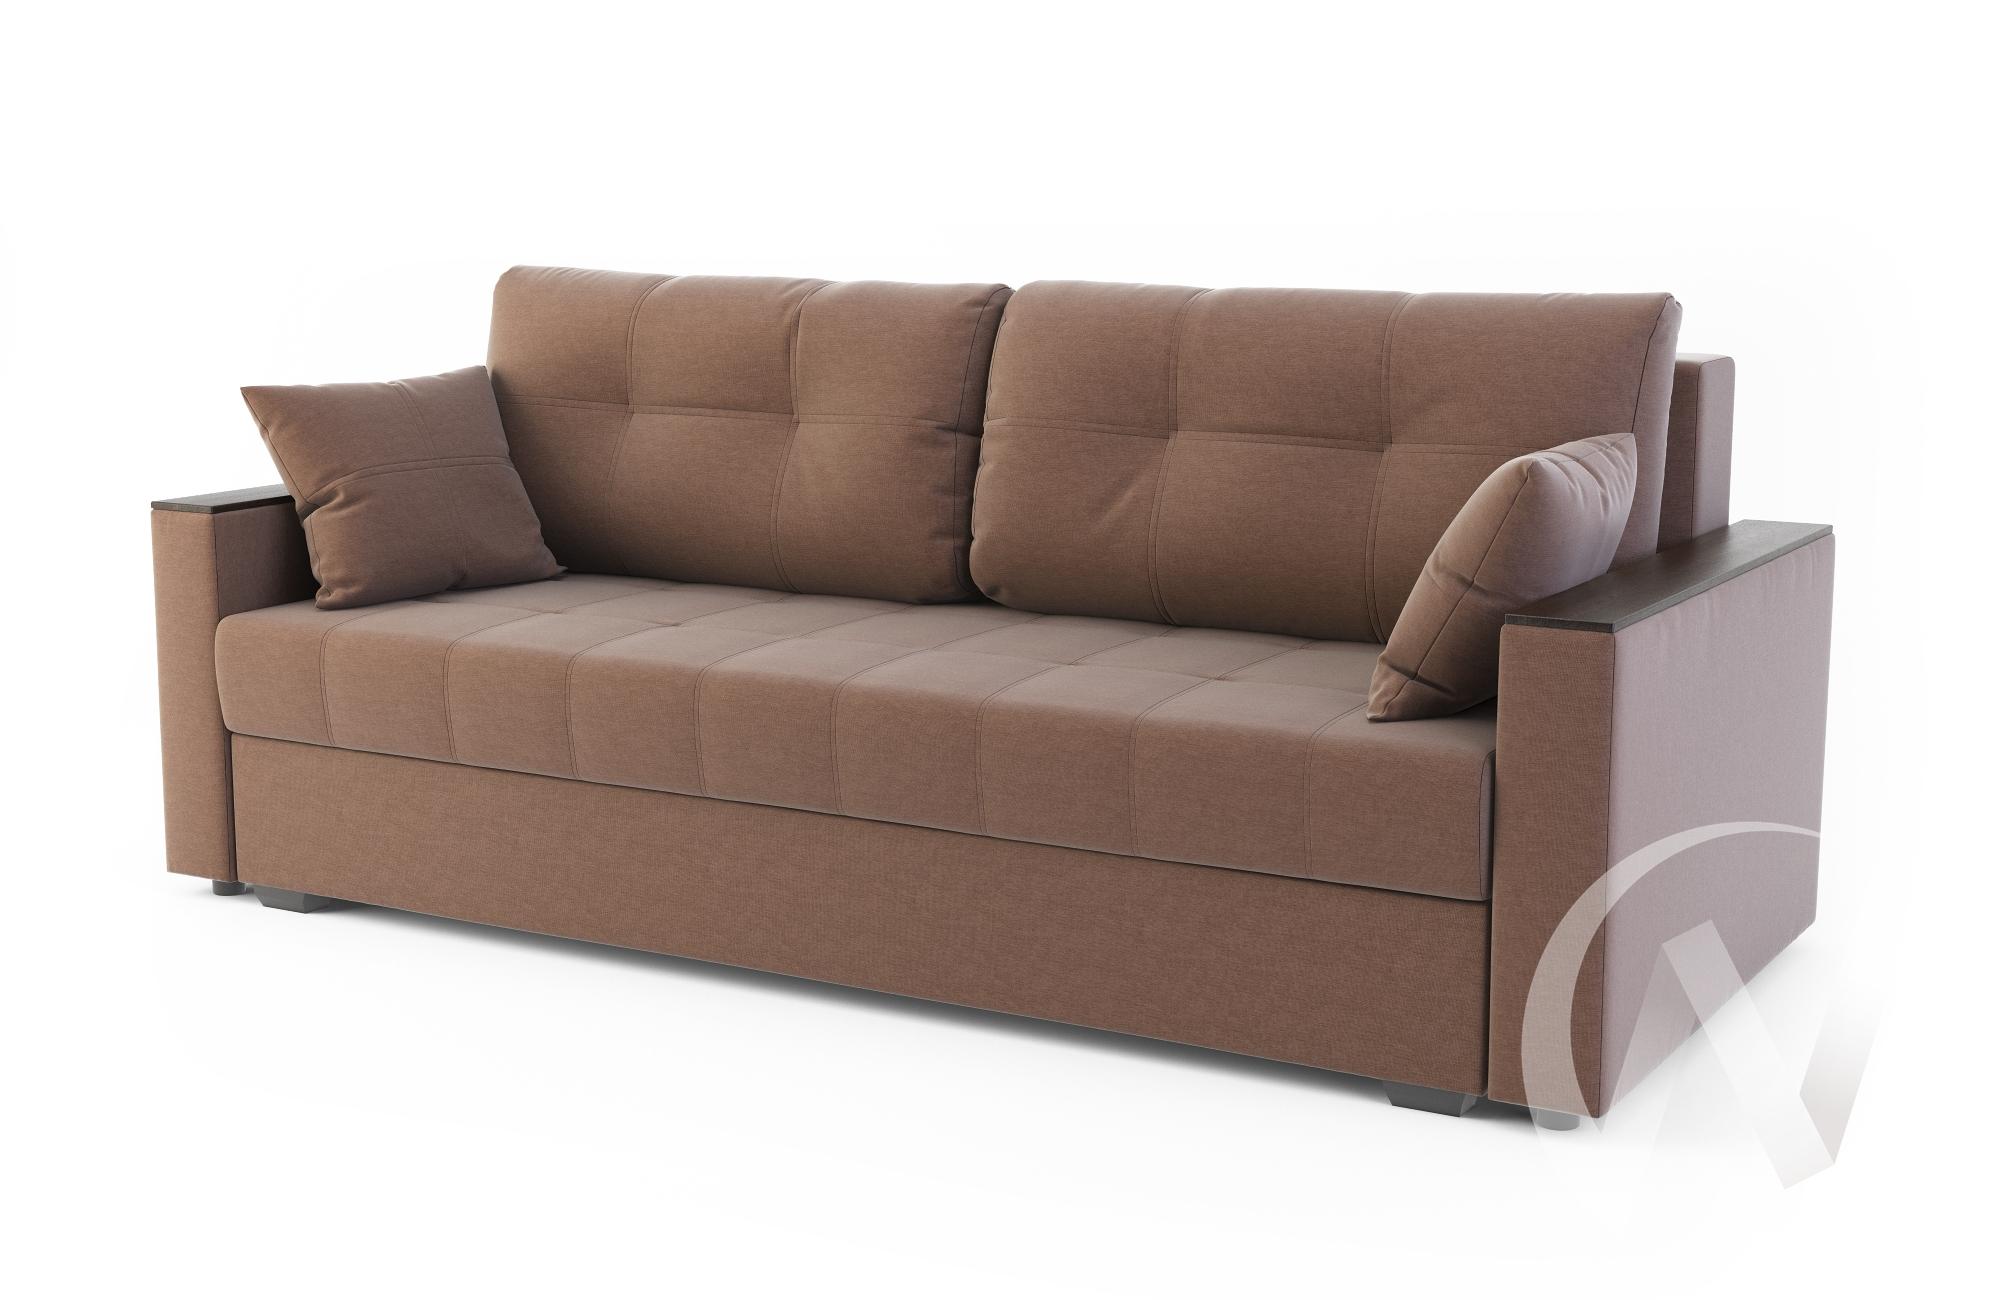 Диван Атланта Некст 1 кат. (Лама №04/Лама №04/Лама №04)  в Томске — интернет магазин МИРА-мебель